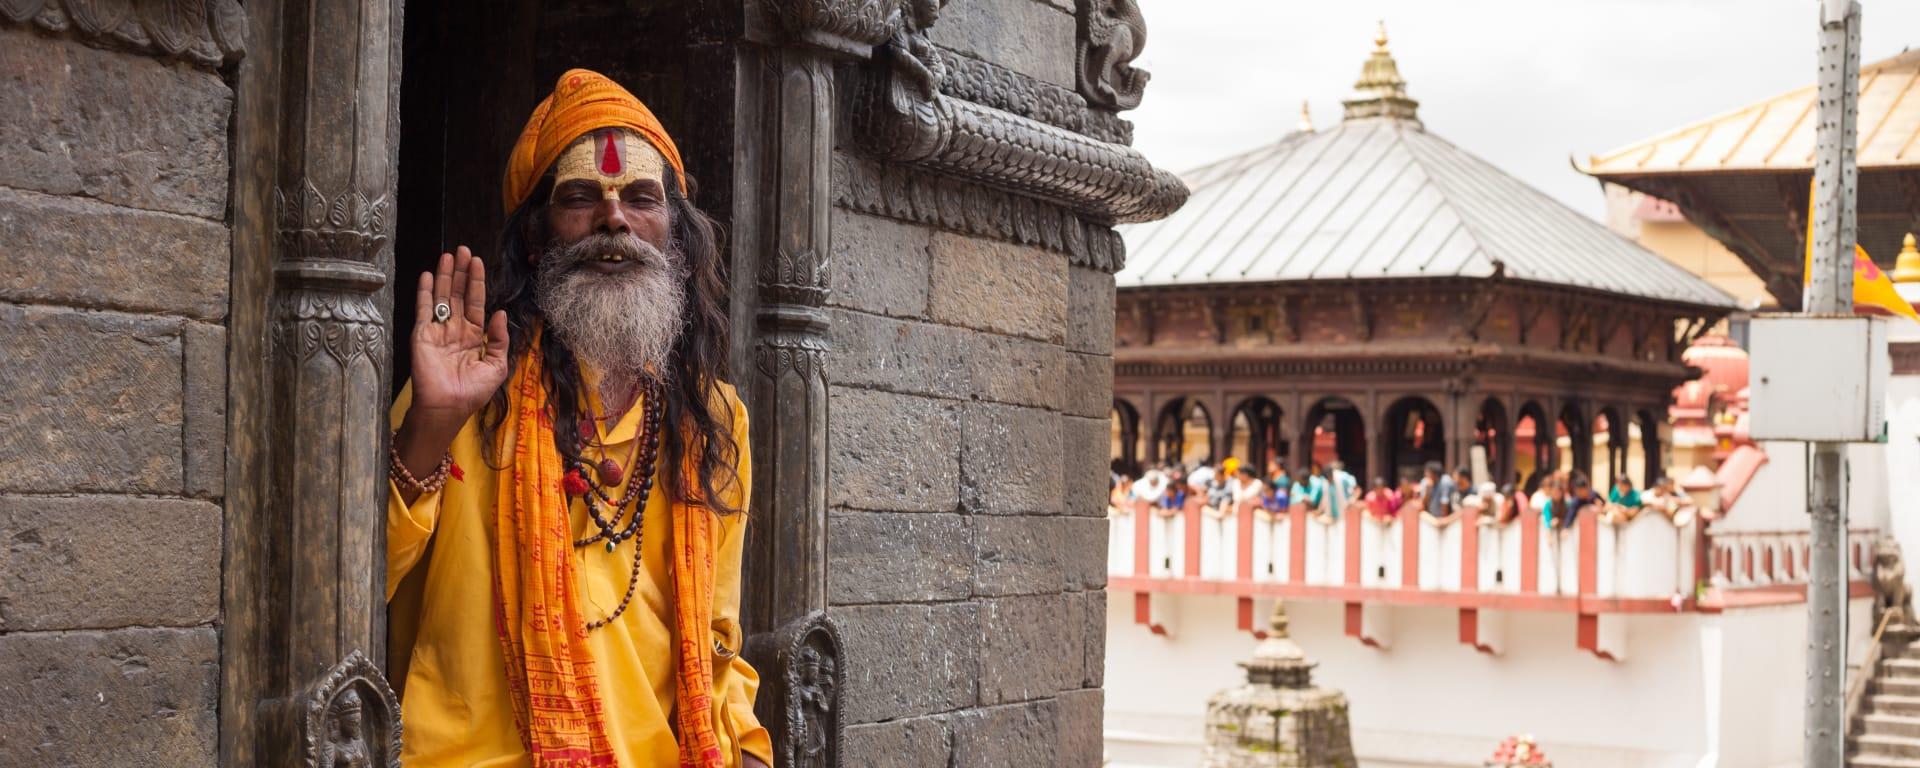 Nepal entdecken mit Tischler Reisen: Nepal Sadhu Pashupatinath